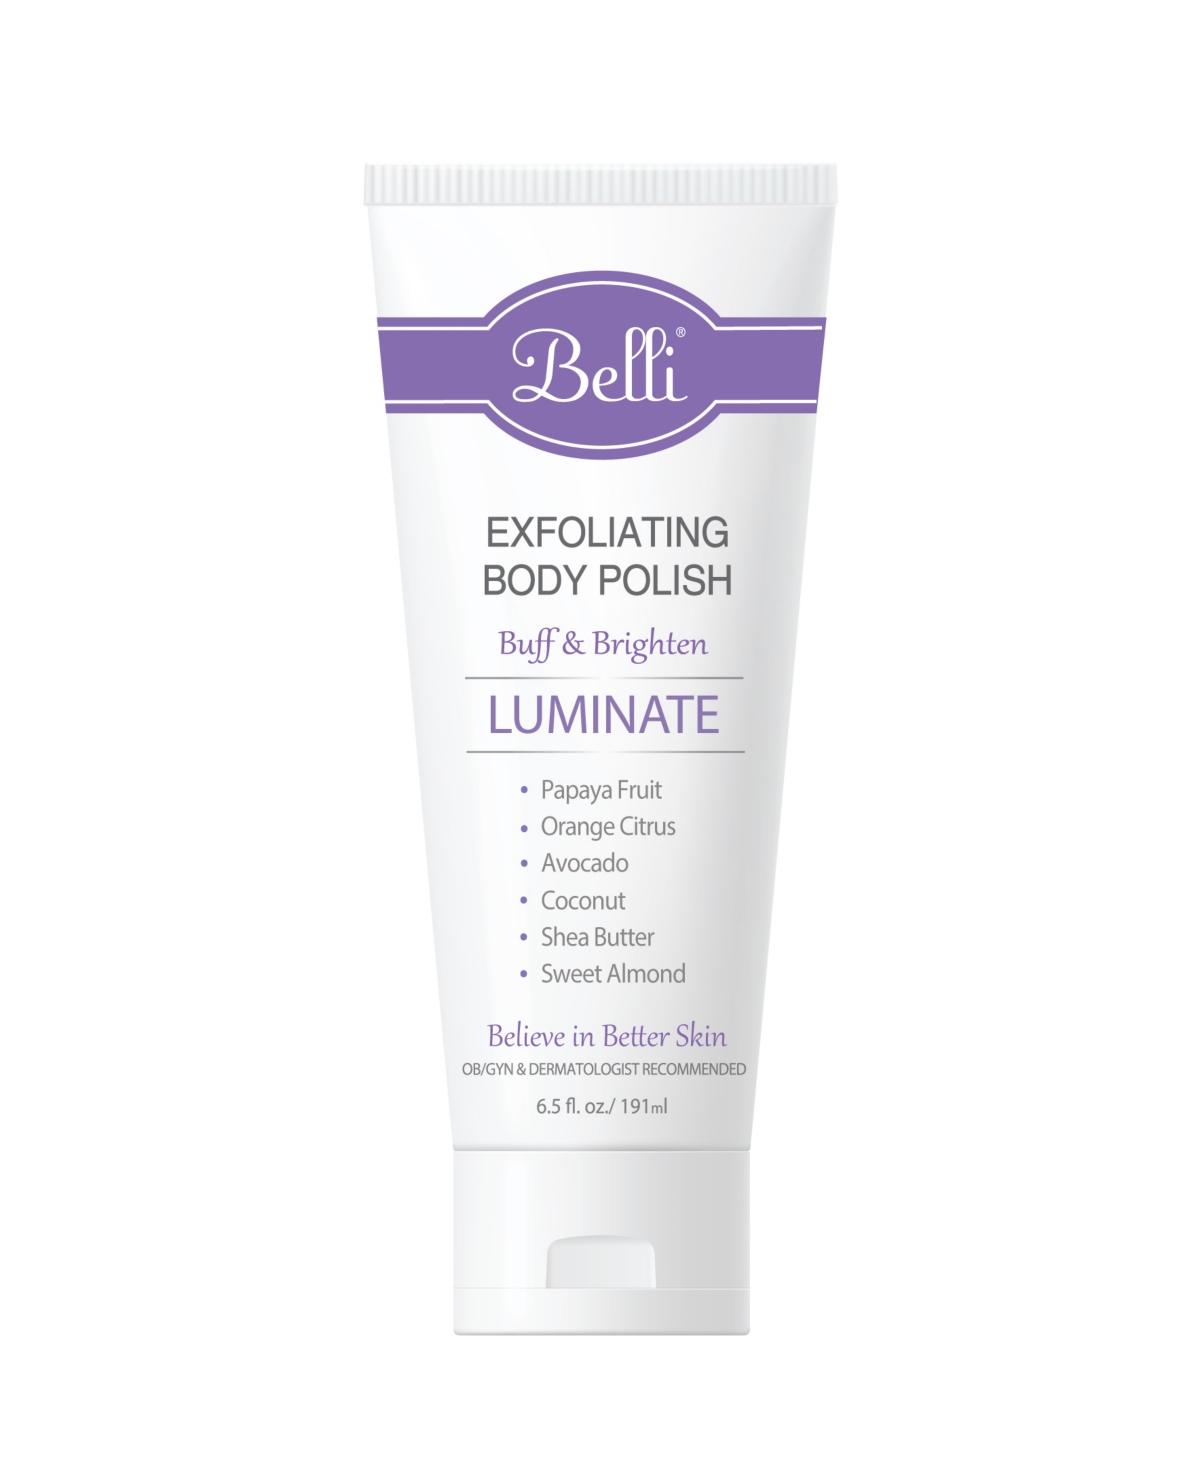 Belli Skin Care Exfoliating Body Polish, 6.5 fl oz